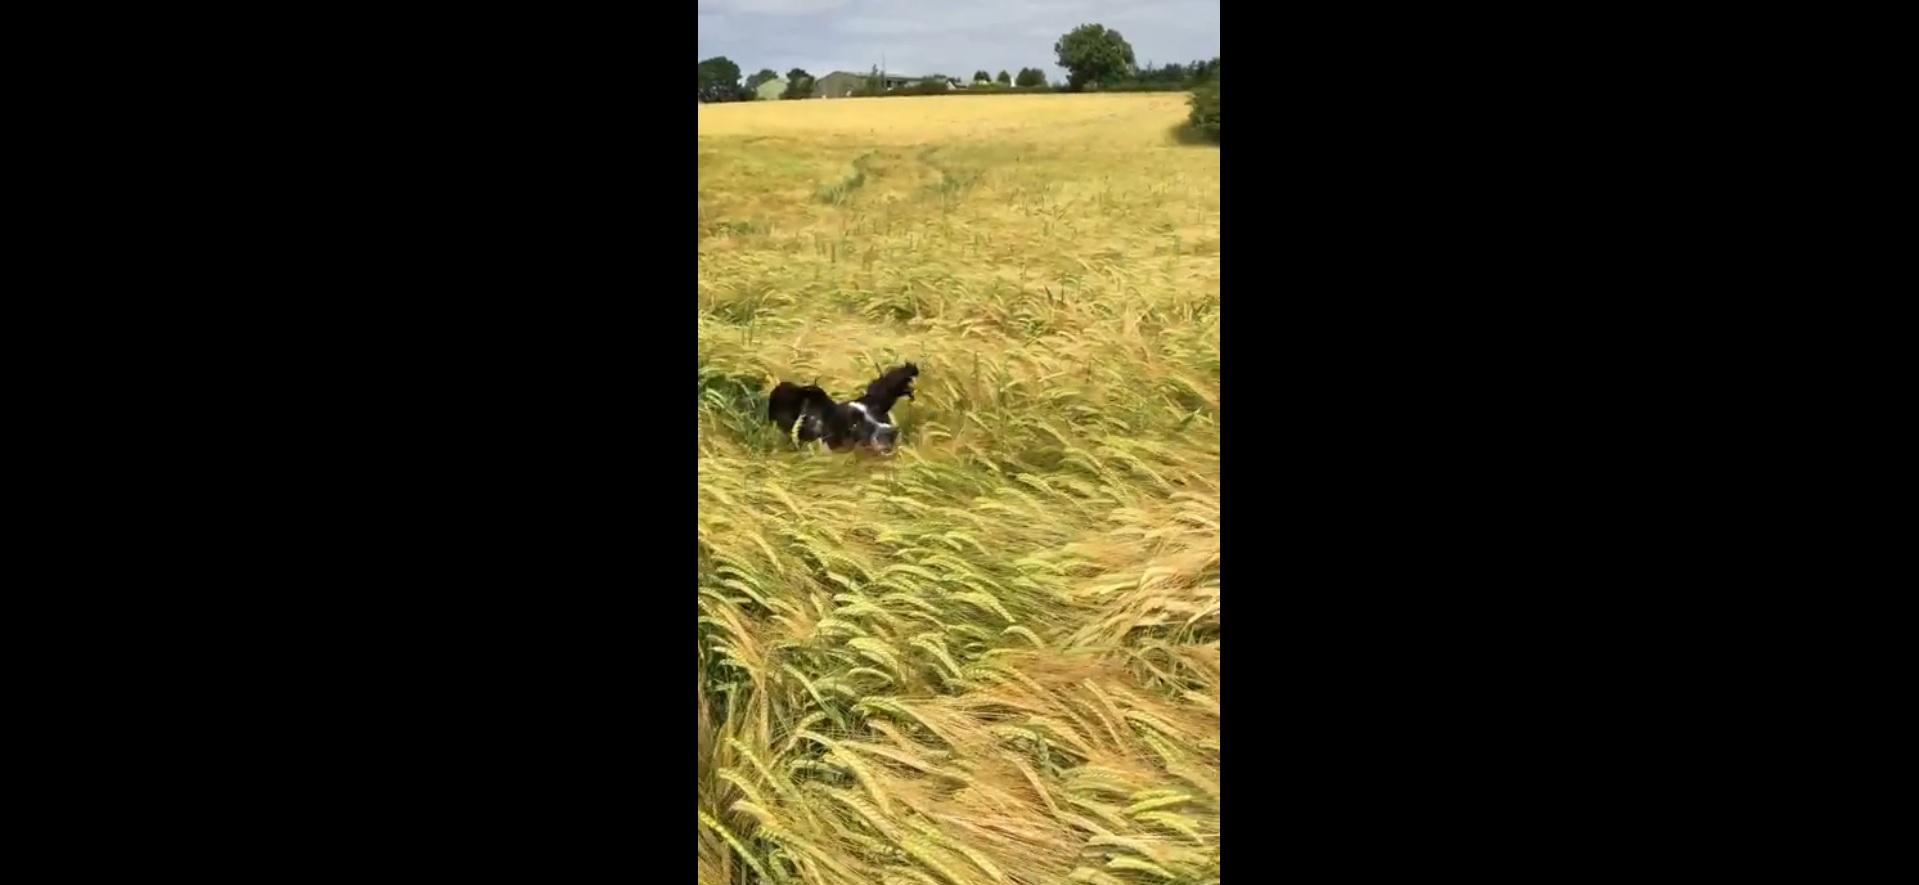 Собака проверяет где находится хозяин (3.361 MB)